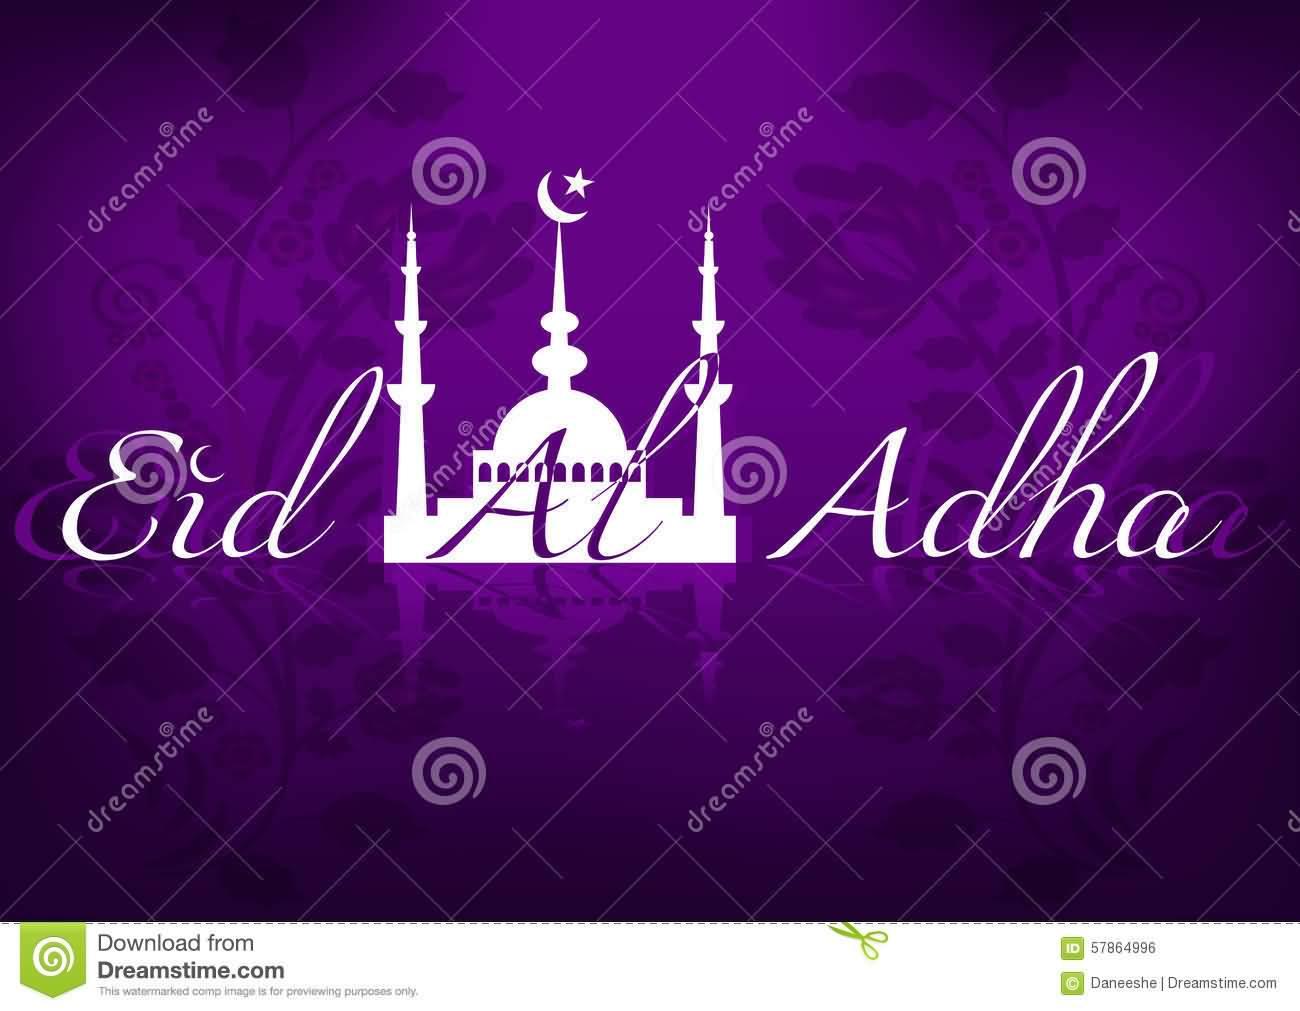 Essay On Eid Ul Adha In Ivoiregion